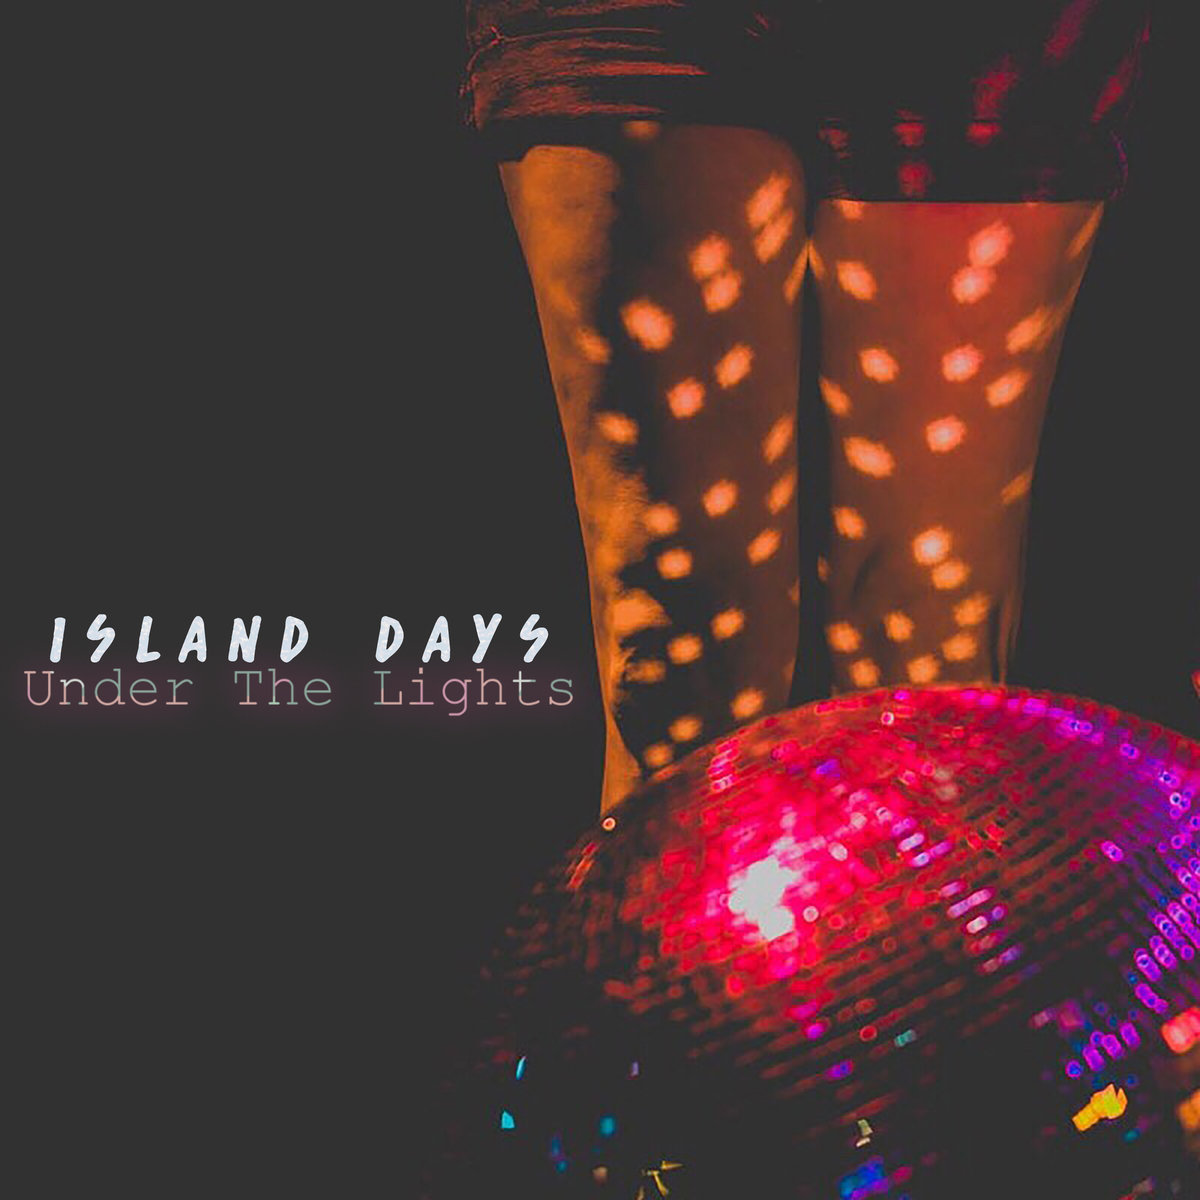 Island Days - Under The Lights (single)